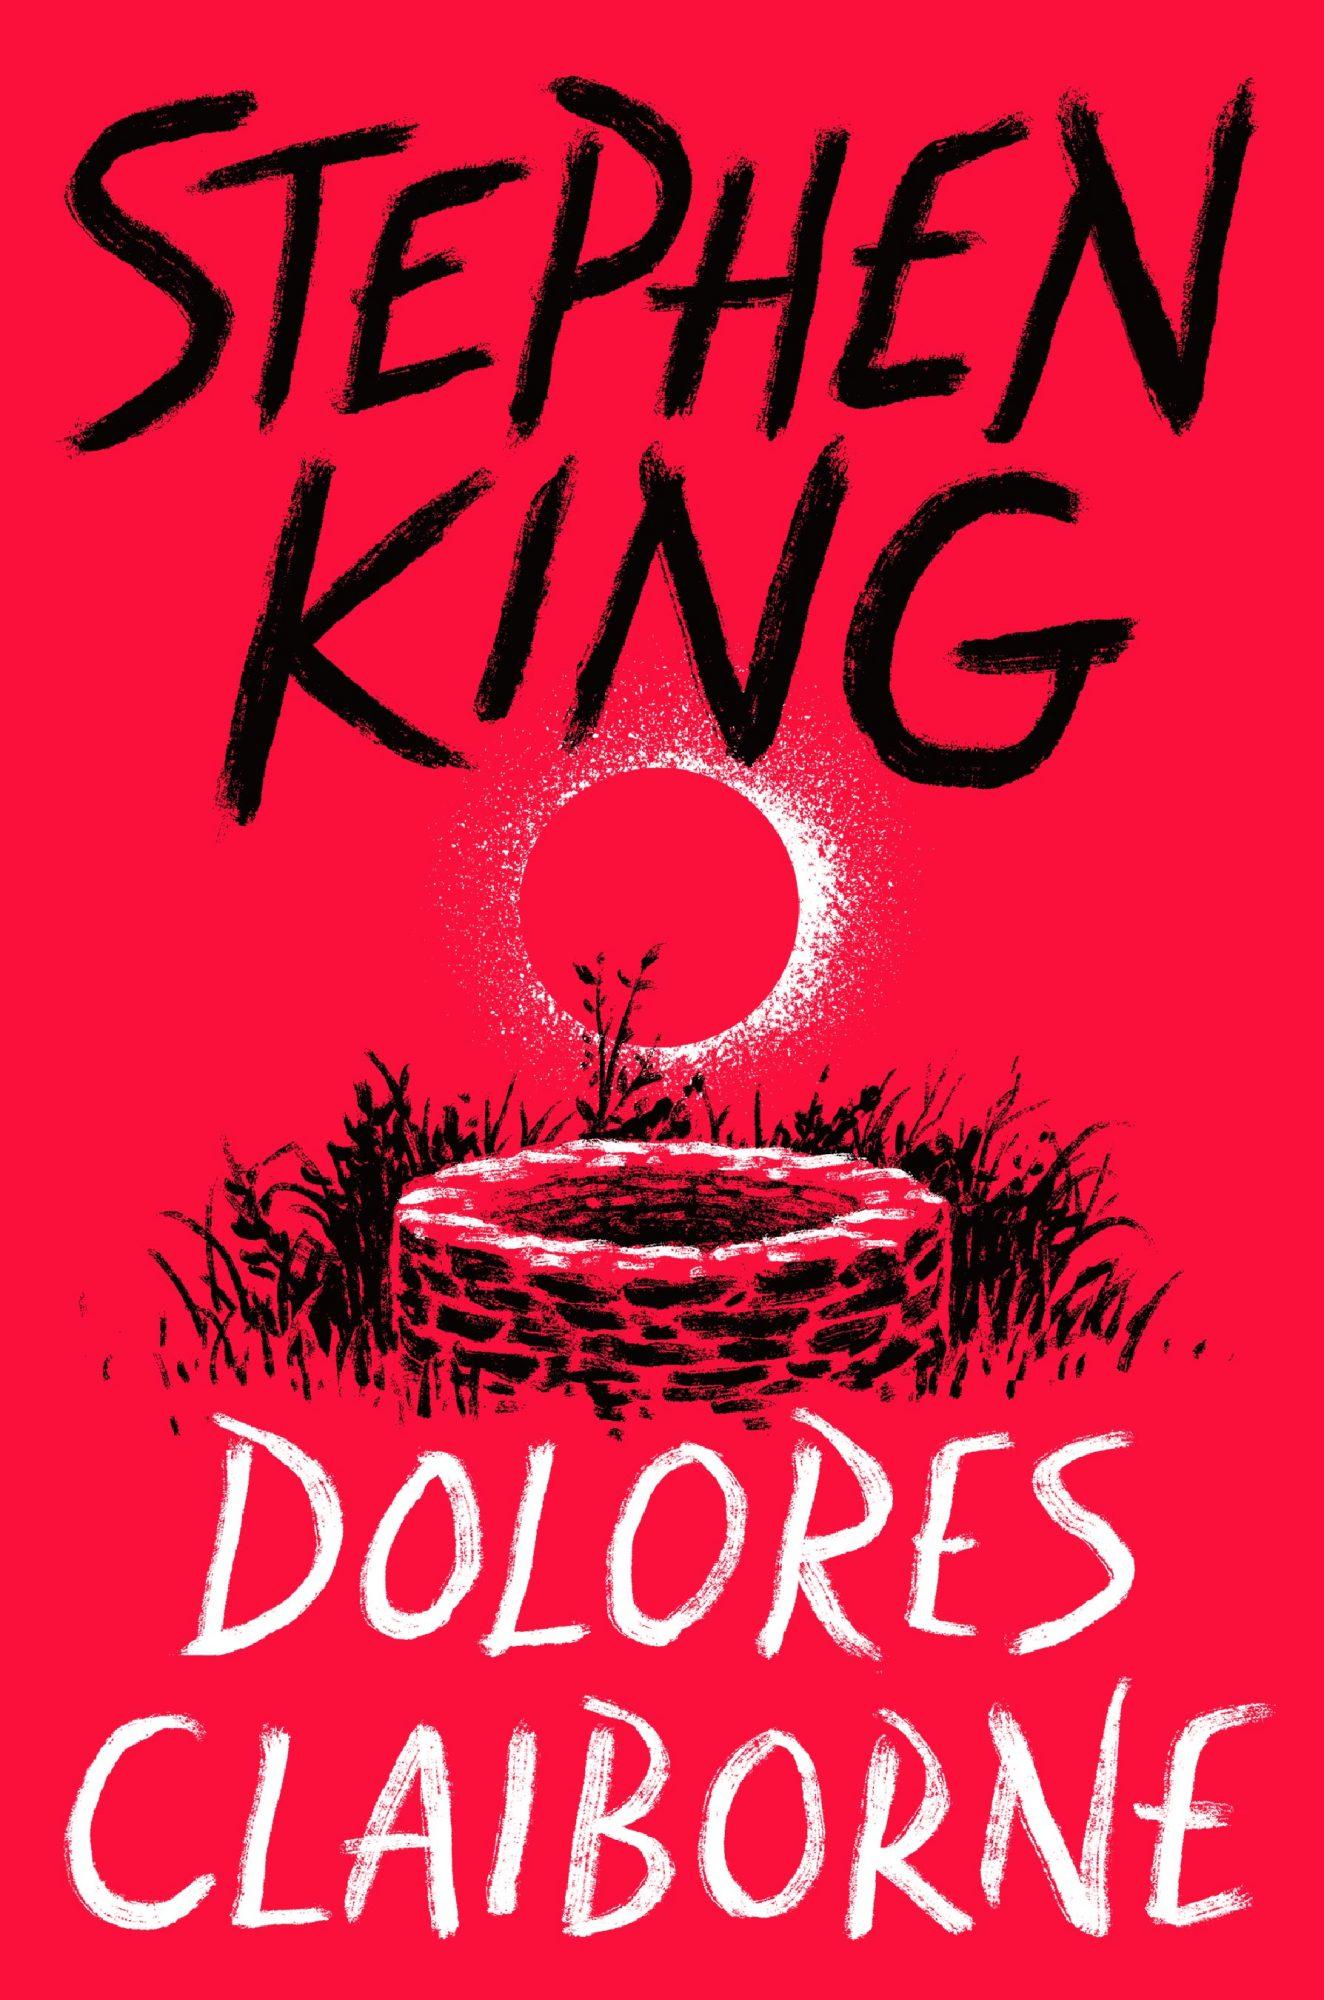 Dolores Claiborne Kindle Editionby Stephen King  (Author)